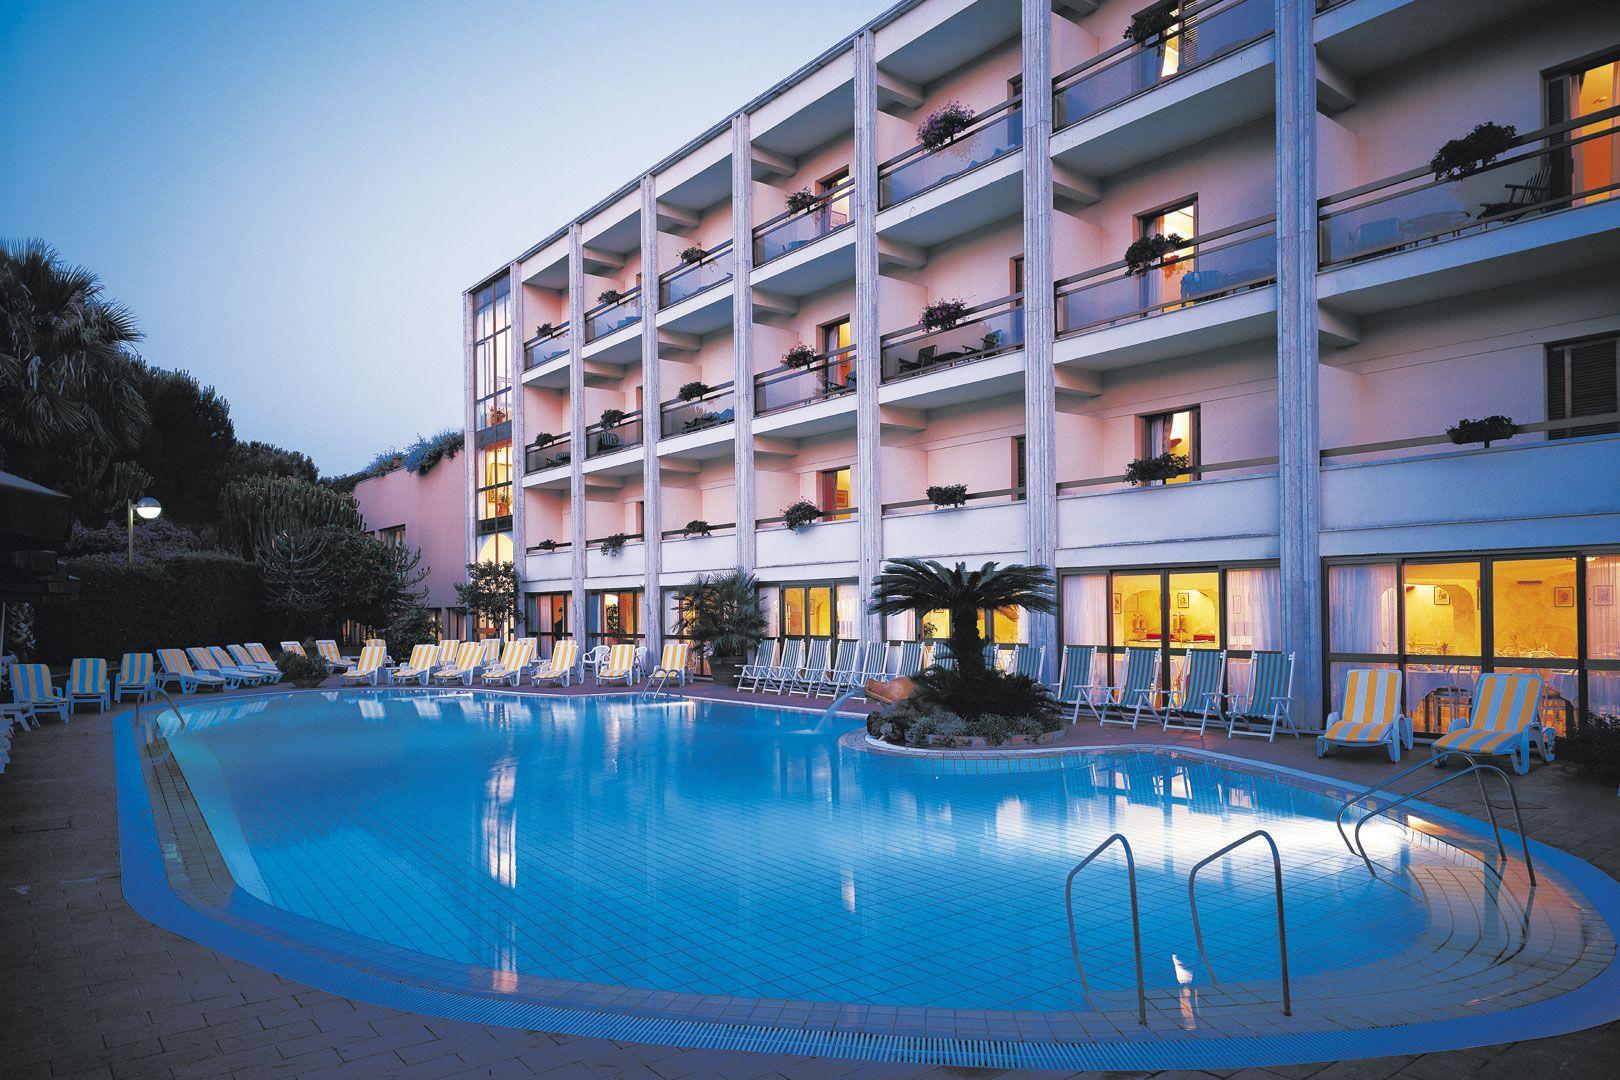 Hotel-Ischia-Grand-Hotel-Terme-di-Augusto-terme-piscina-esterna-2